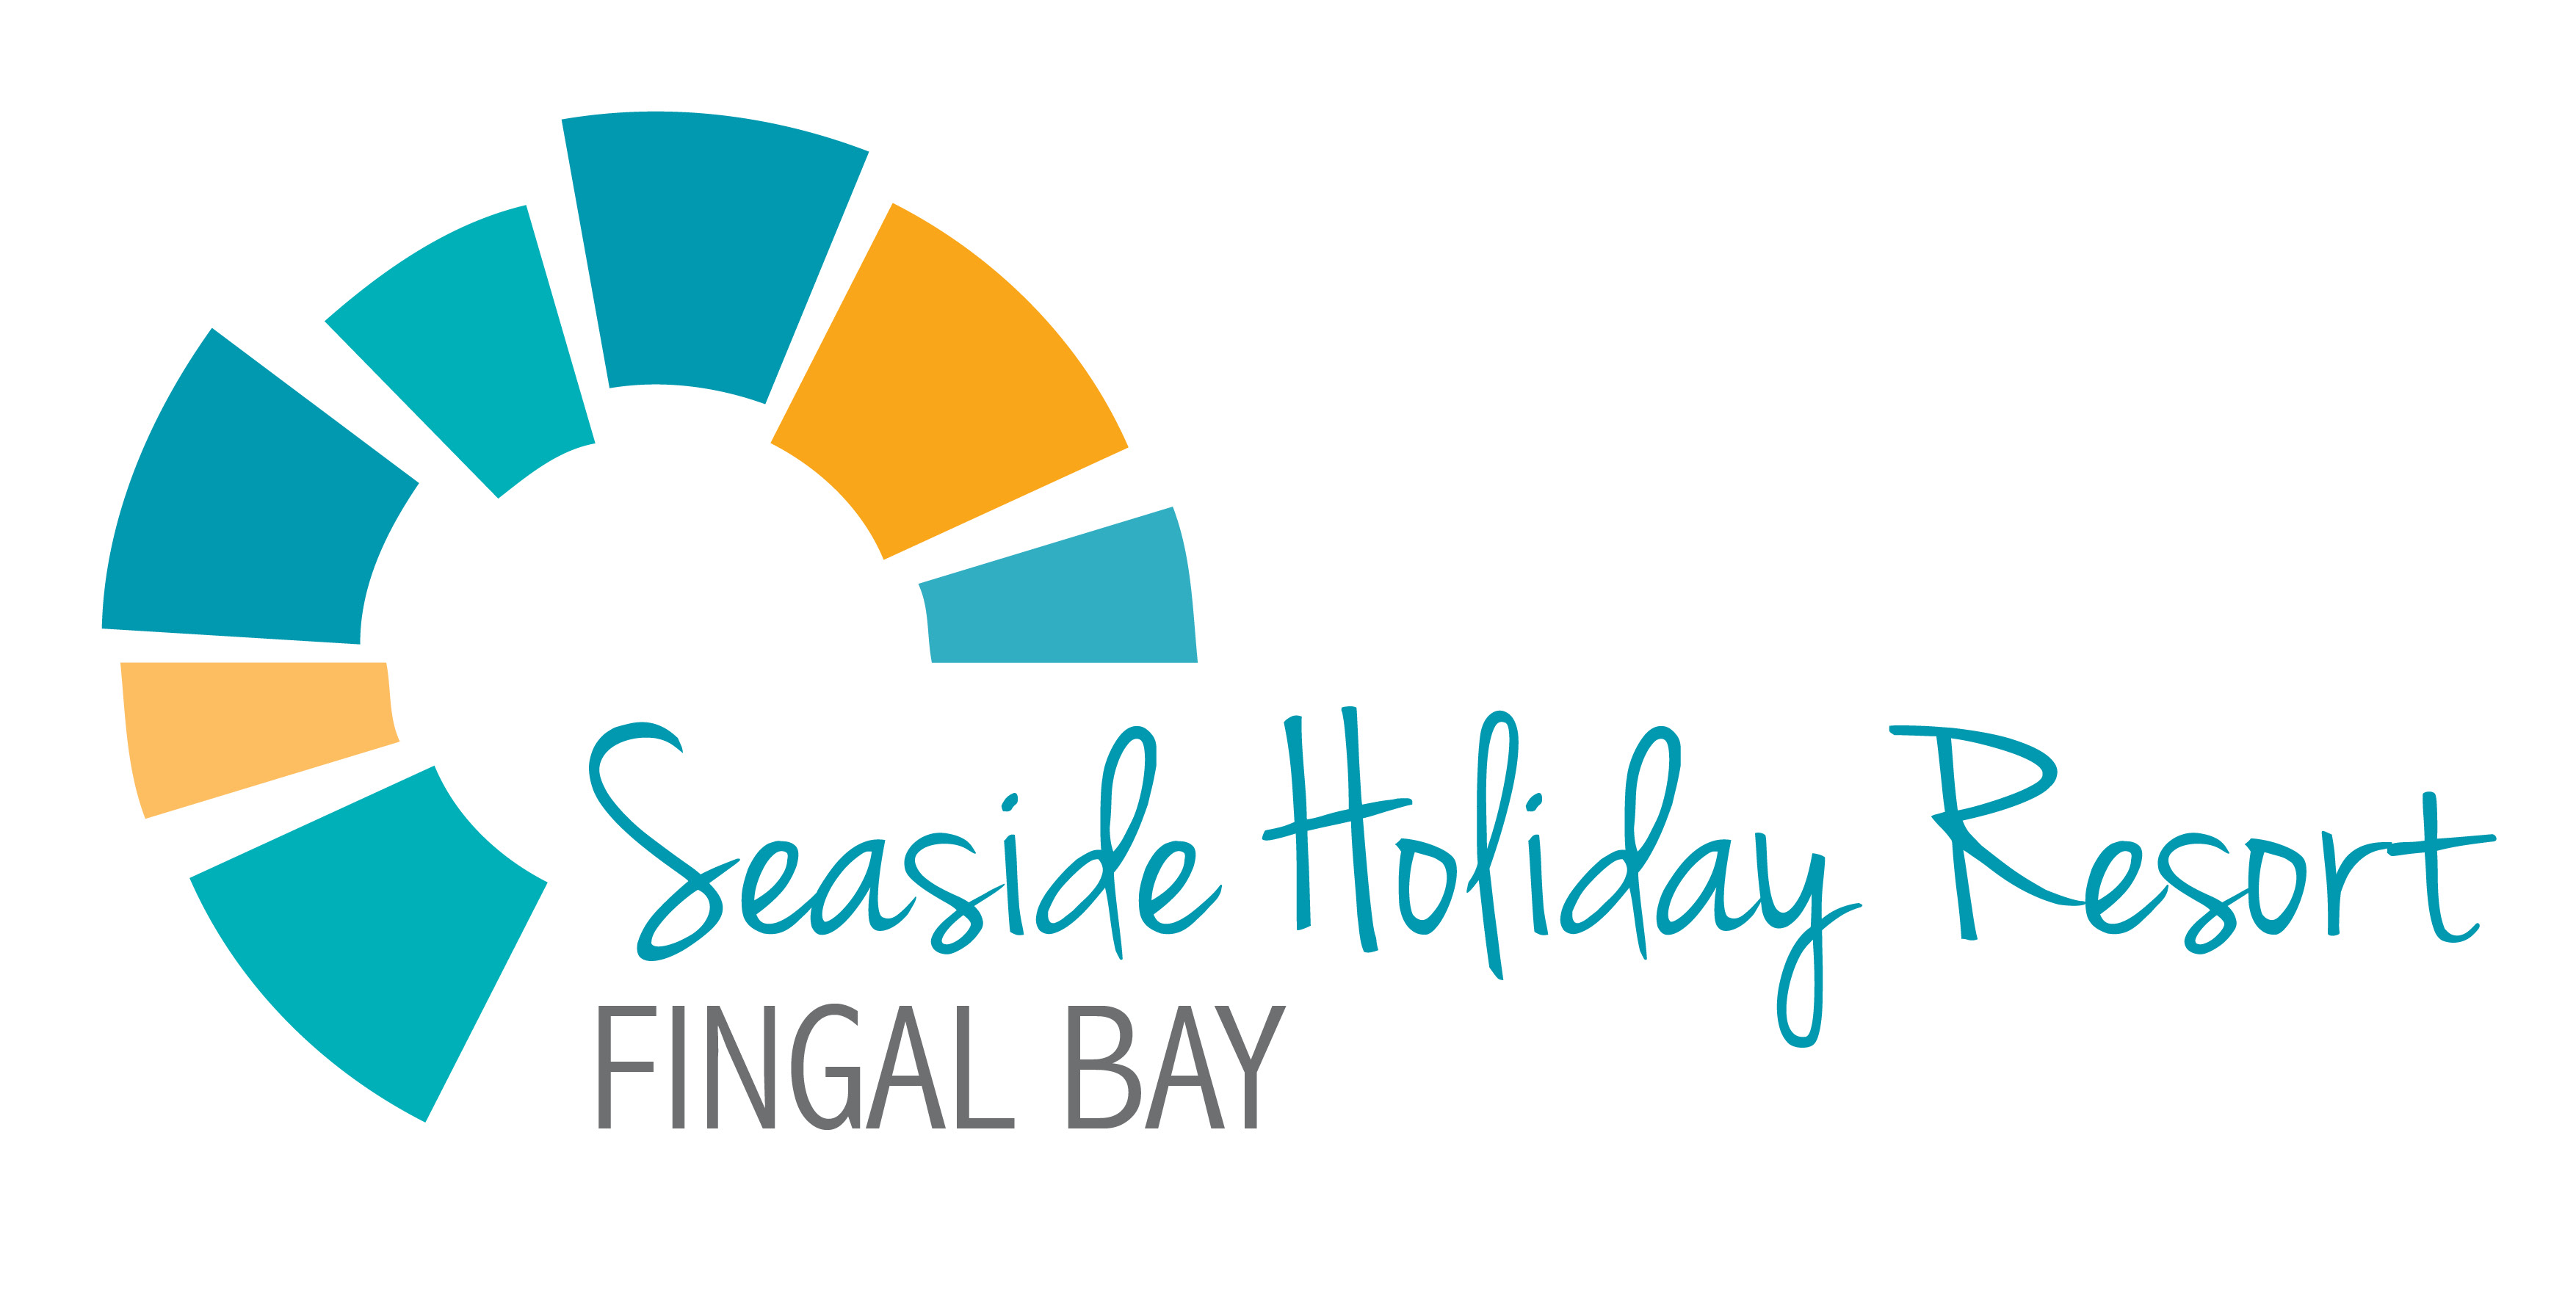 Seaside Resort Logo